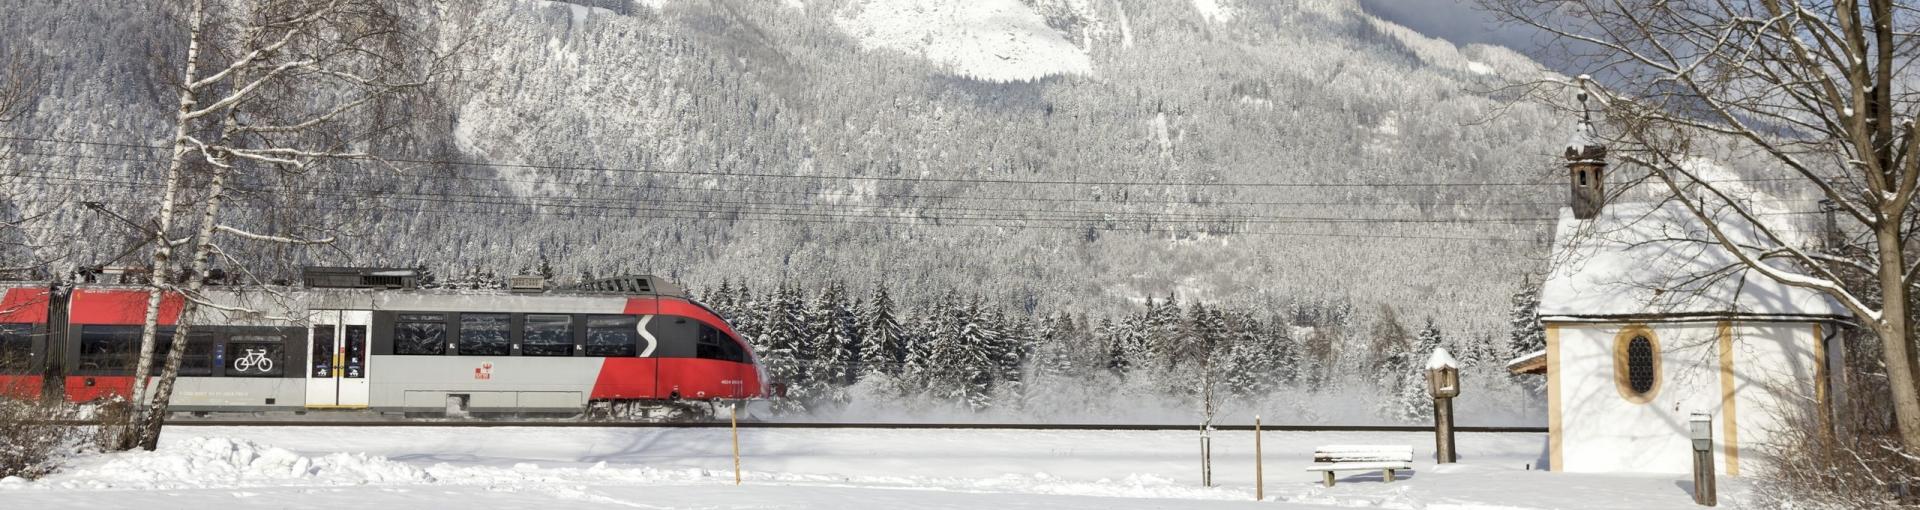 Anreise nach Tirol